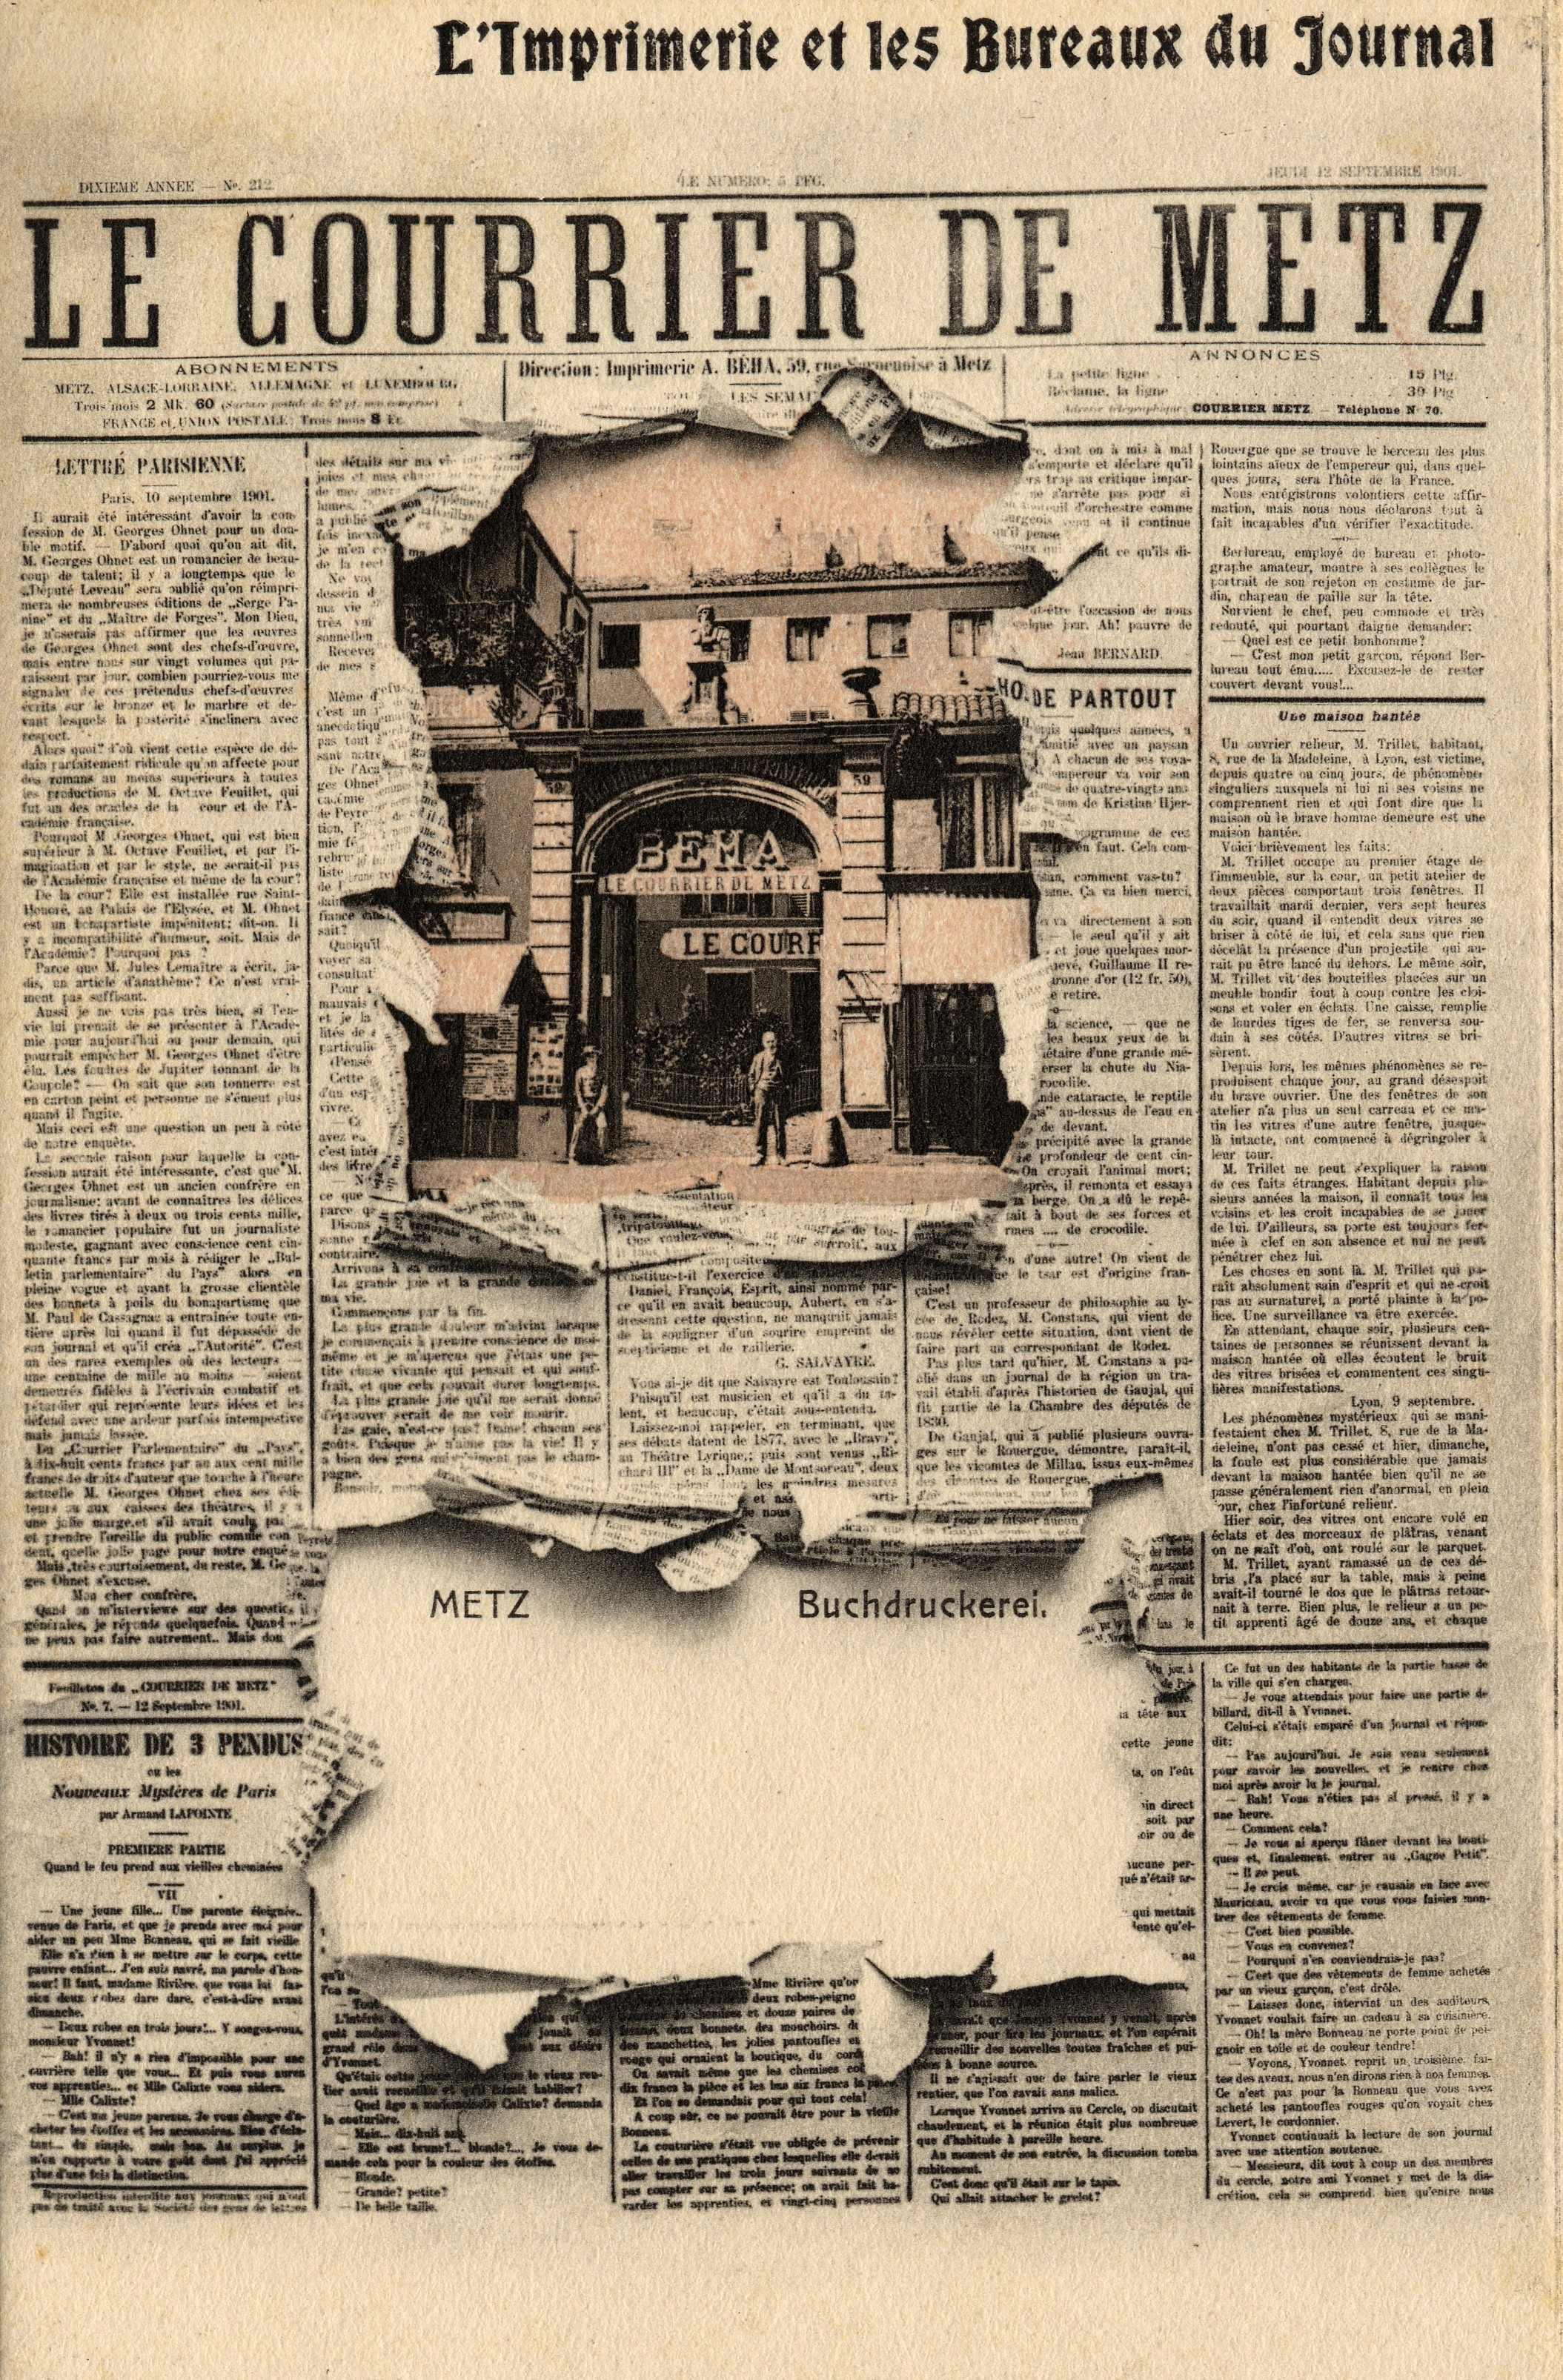 Contenu du Le Courrier de Metz - Metz Buchdruckerei